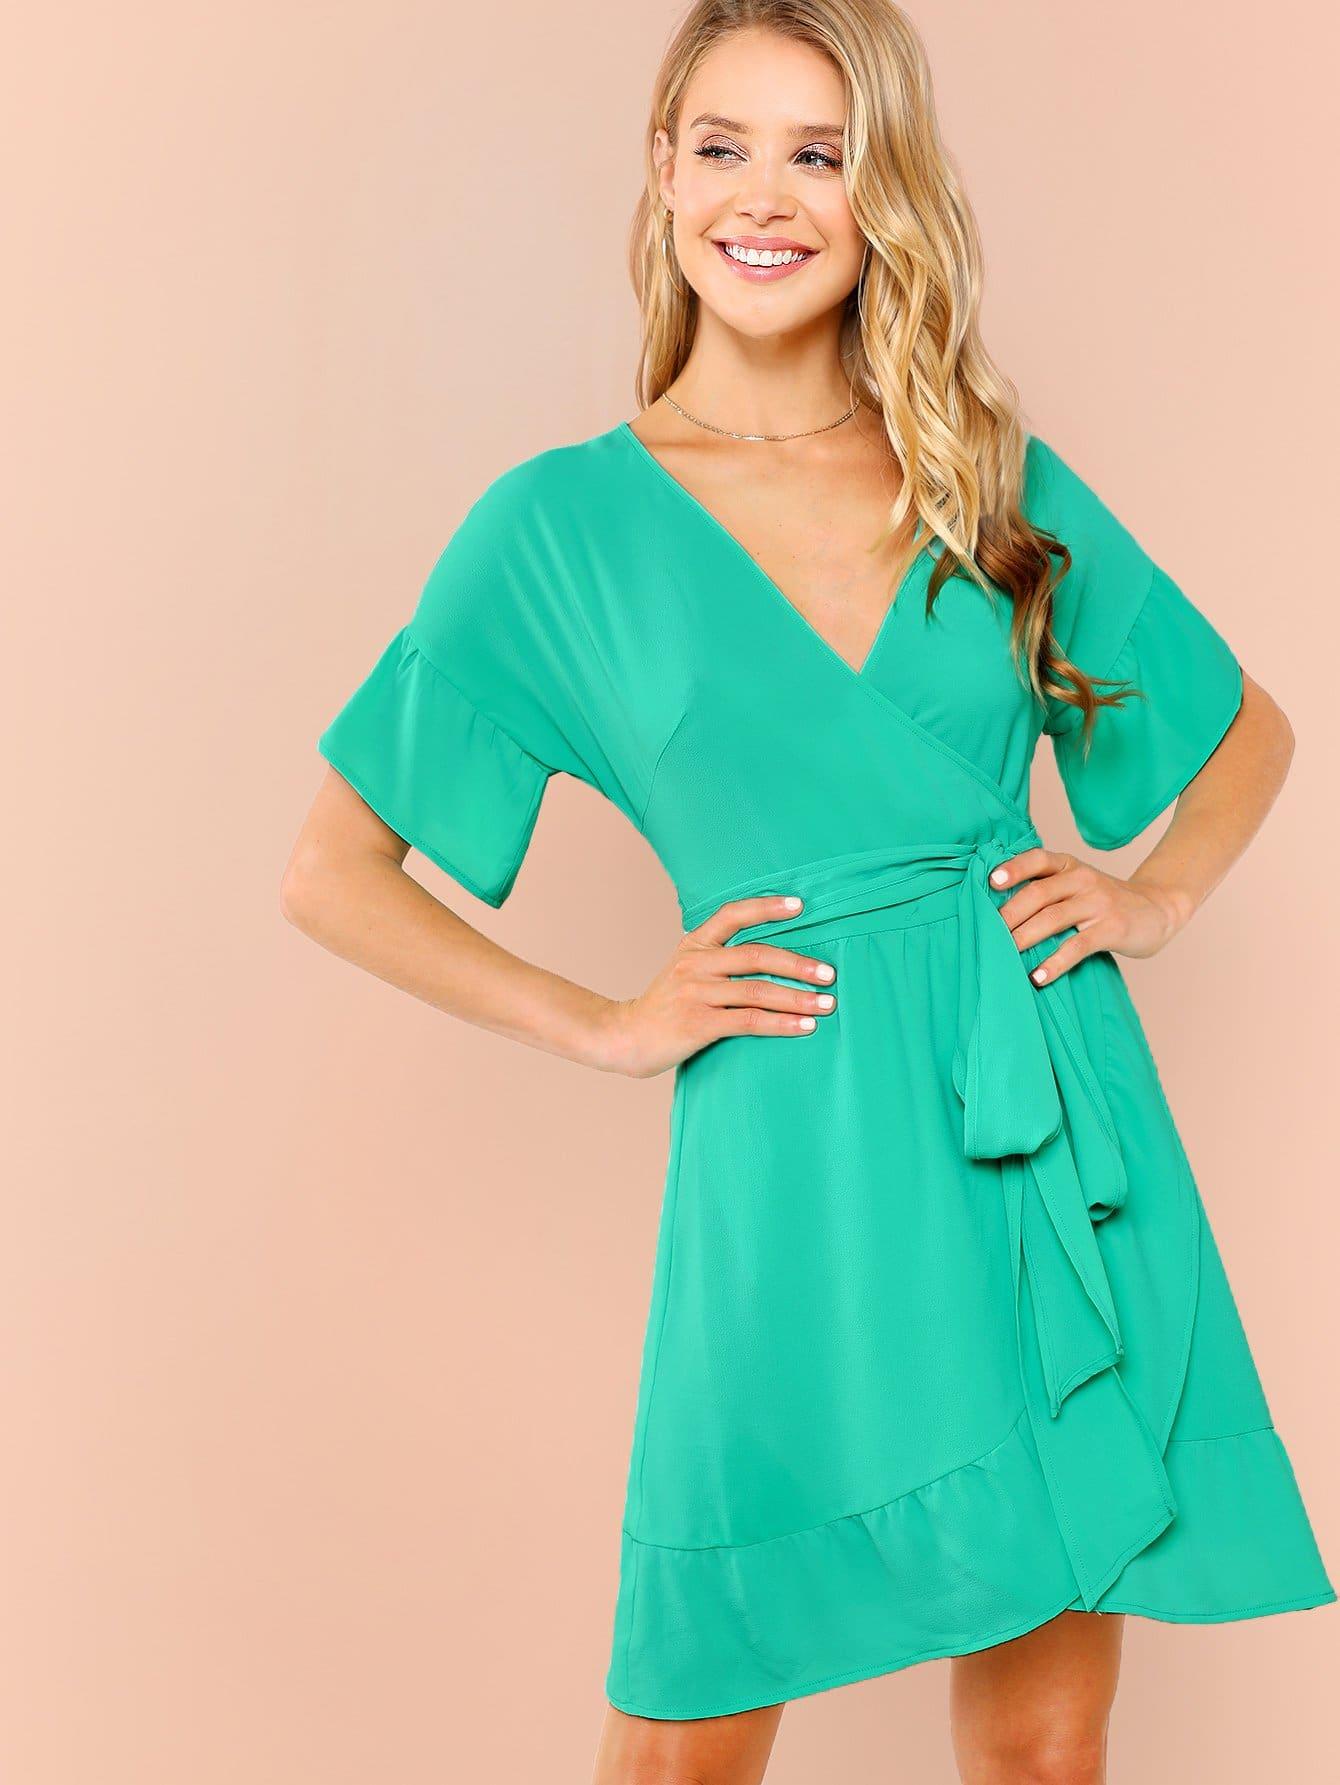 Купить Платье для обертывания, Allie Leggett, SheIn